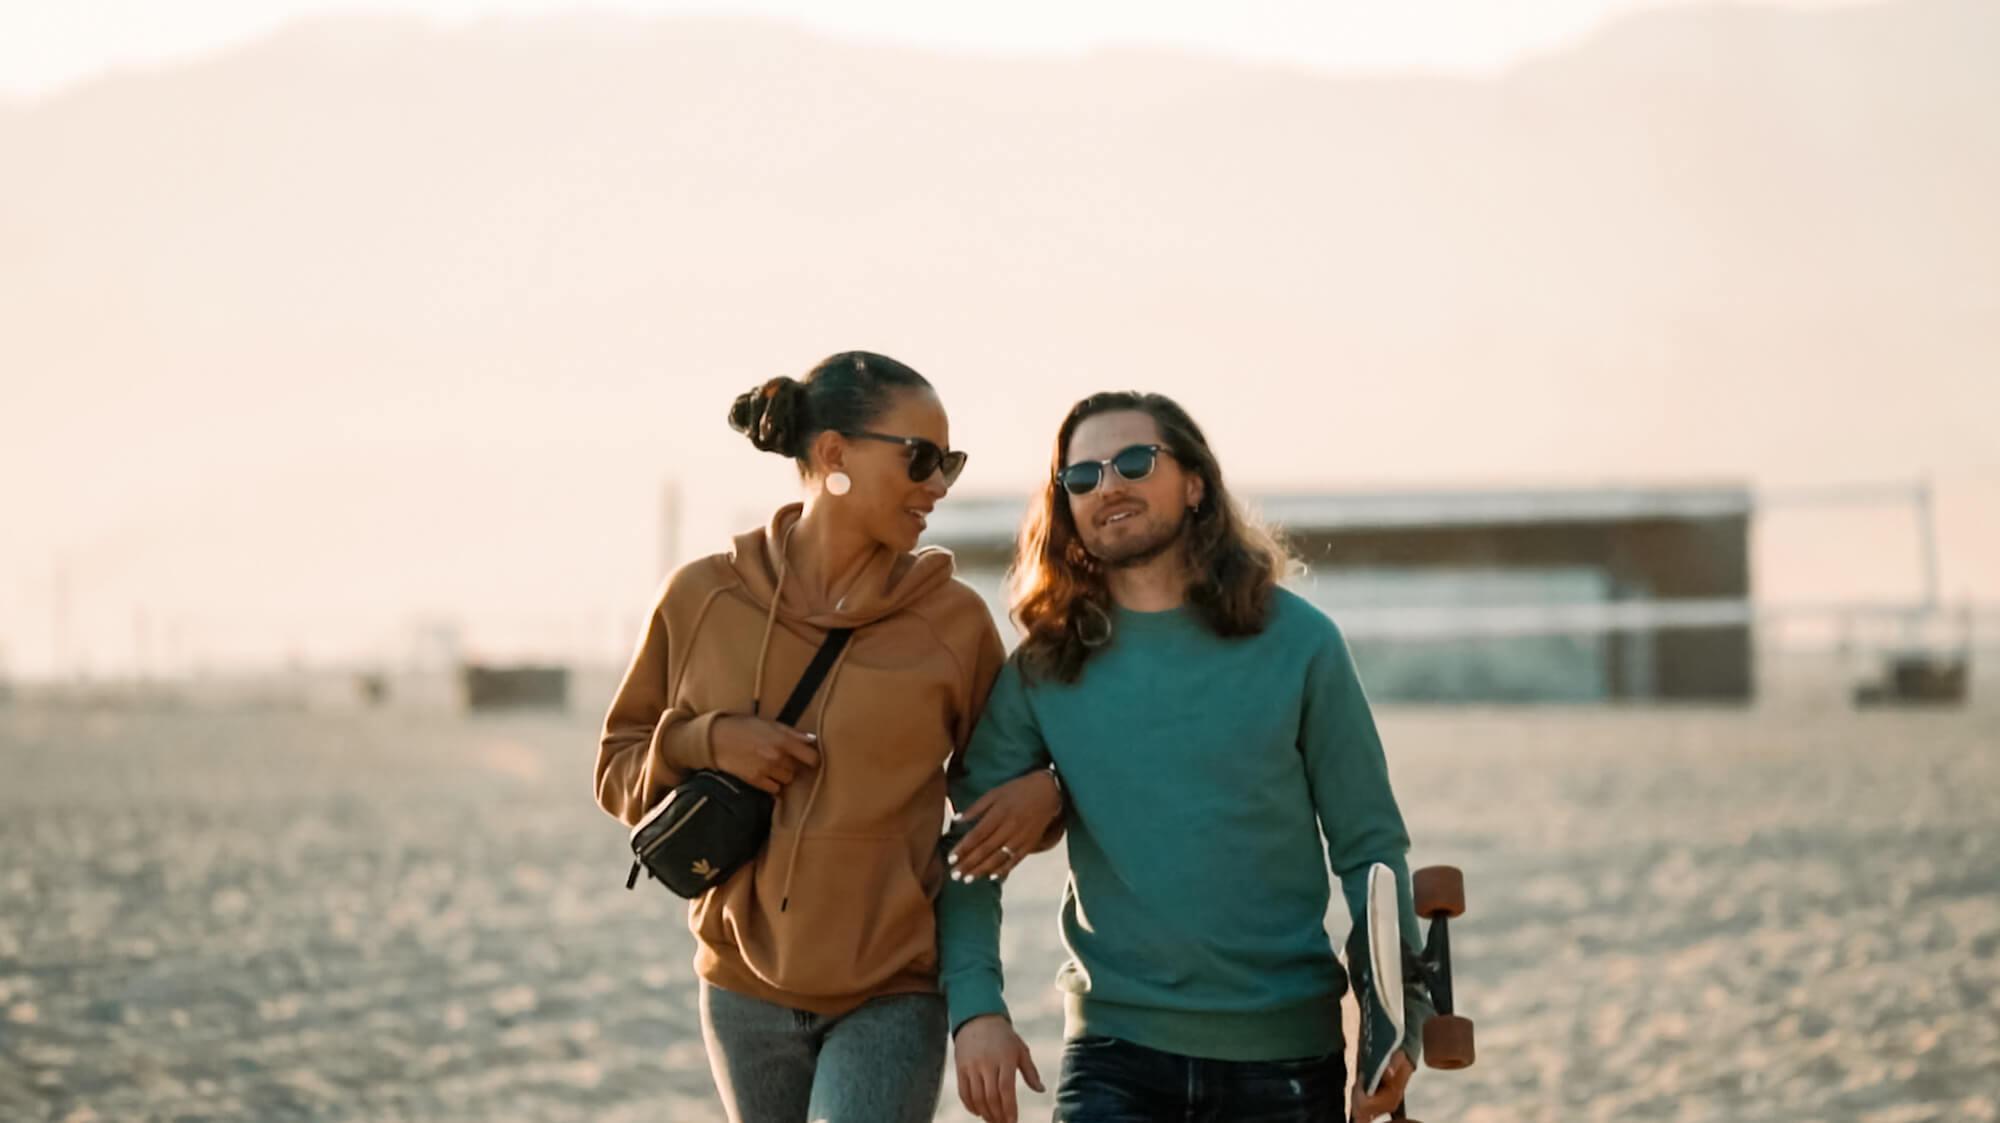 interracial couple walking on the beach Santa Monica, CA